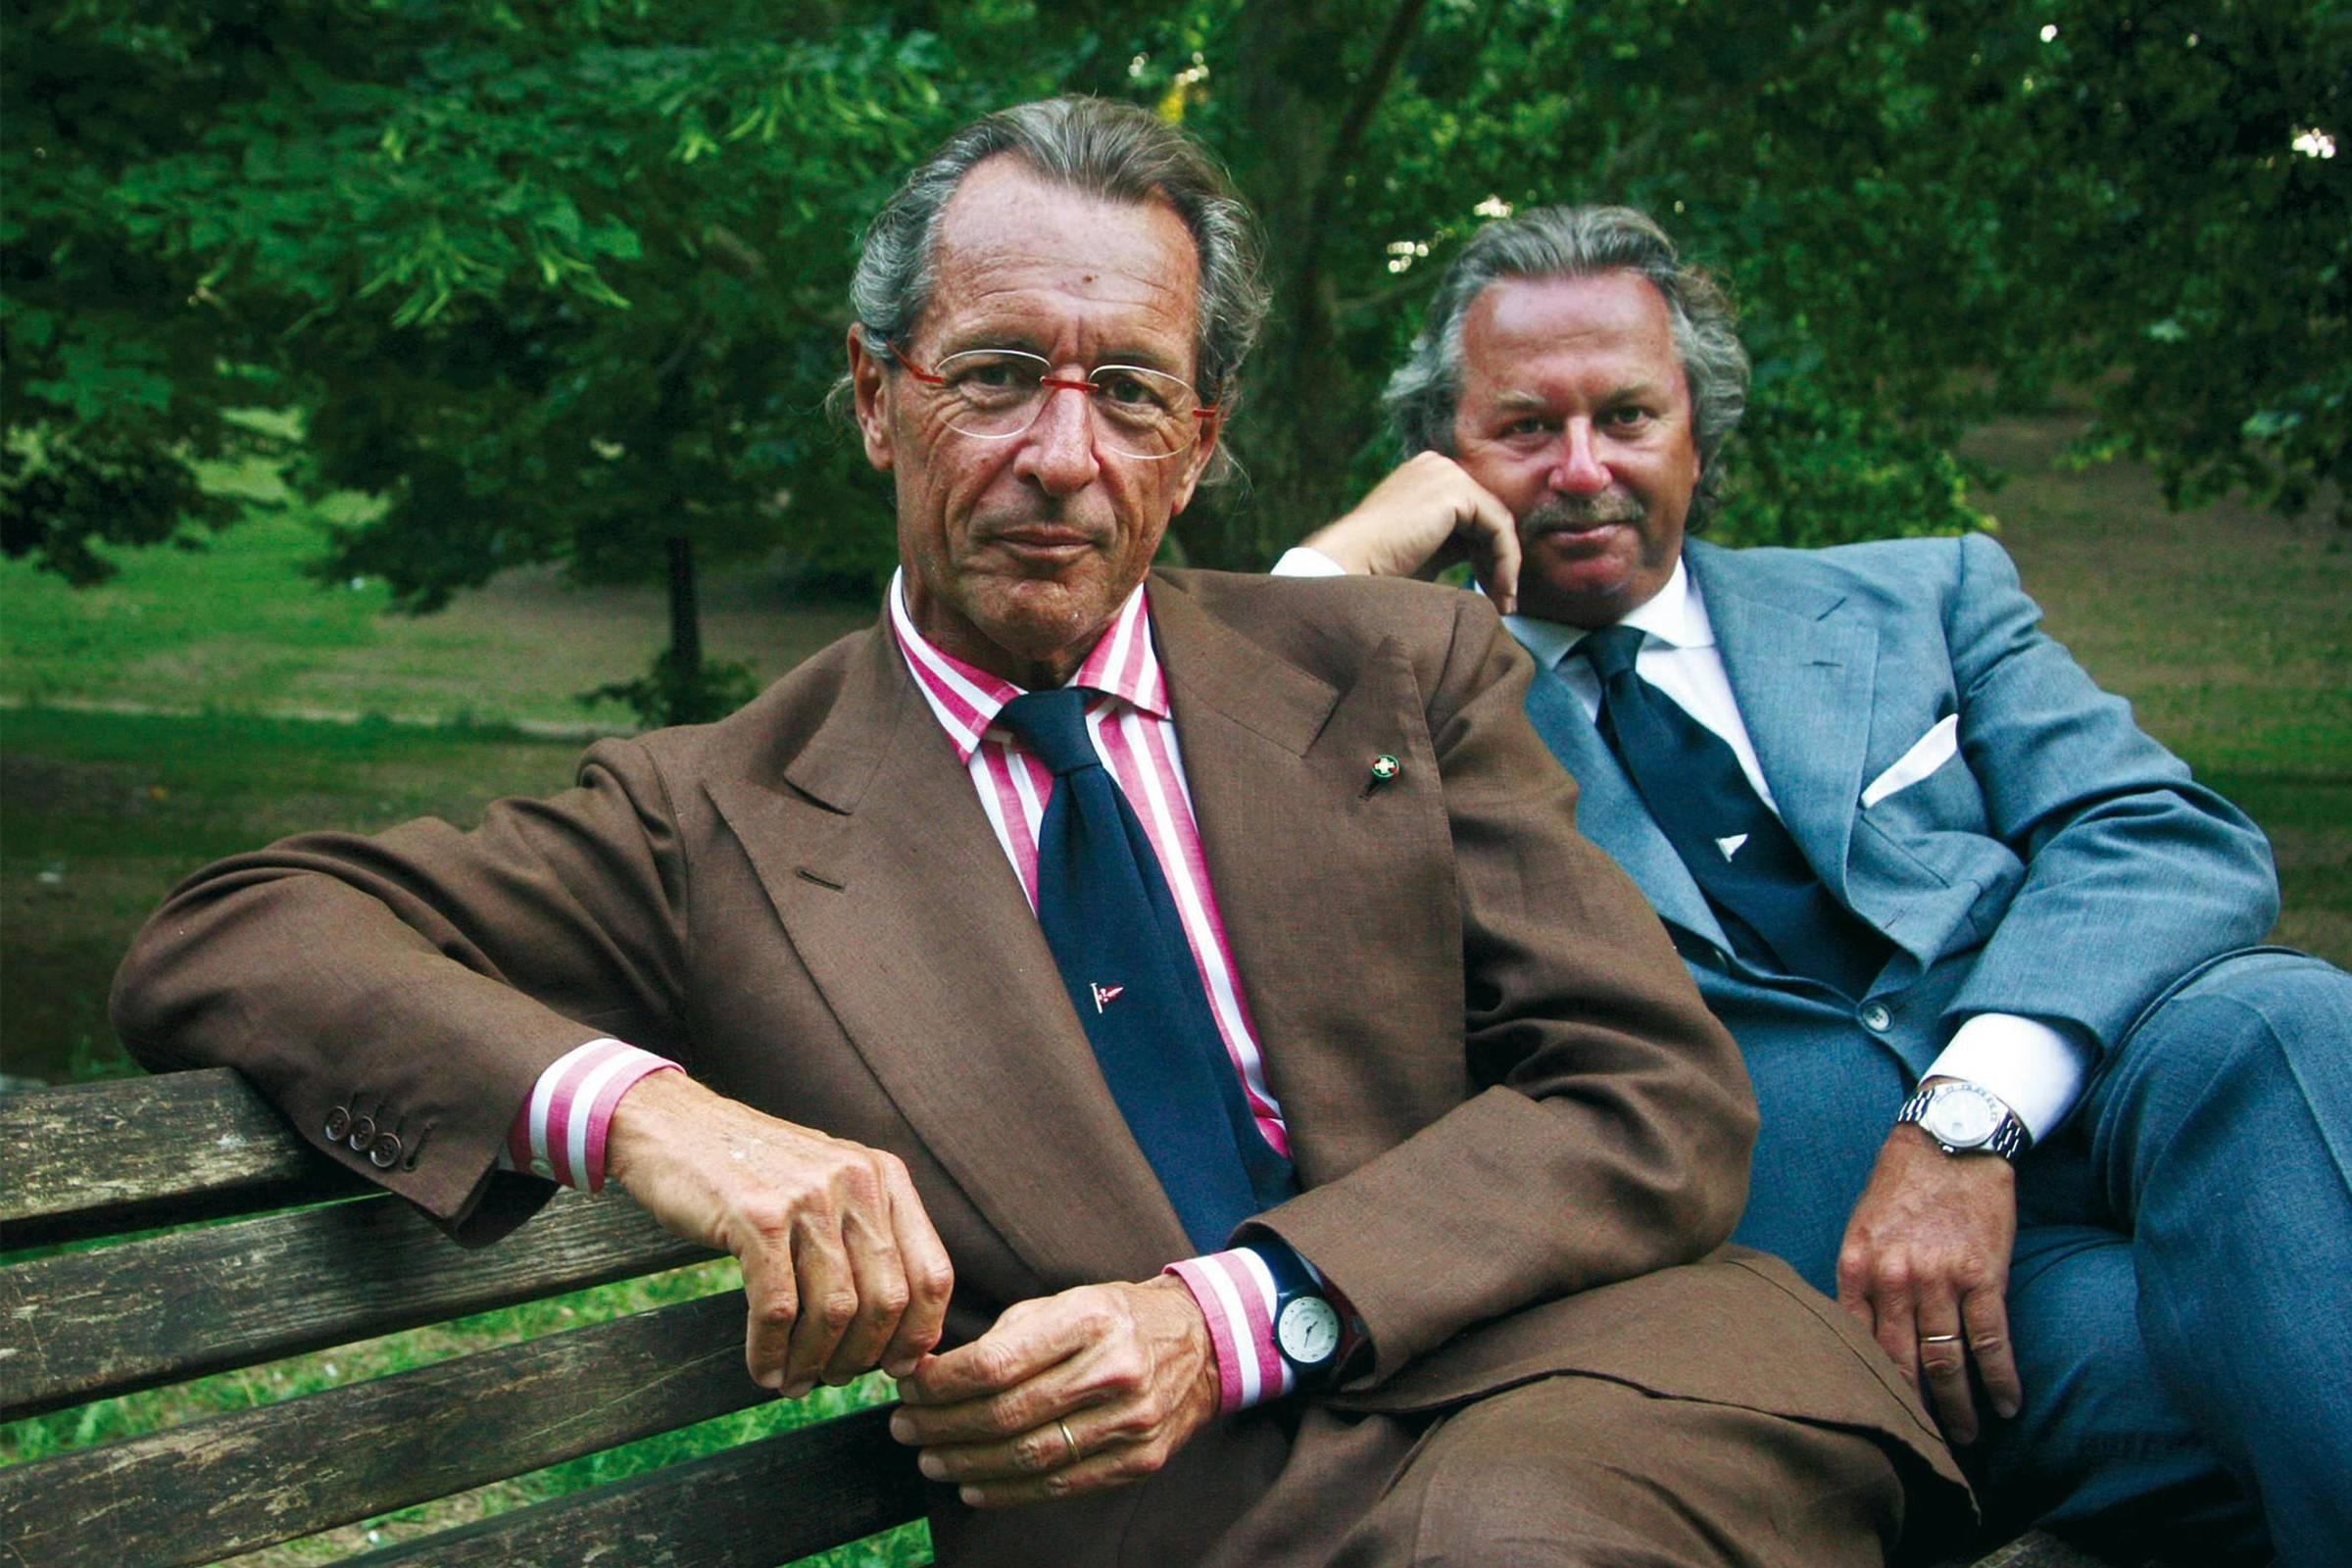 The last generation of Loro Piana's to lead the house. From left to right: Sergio and Pier-Luigi Loro Piana